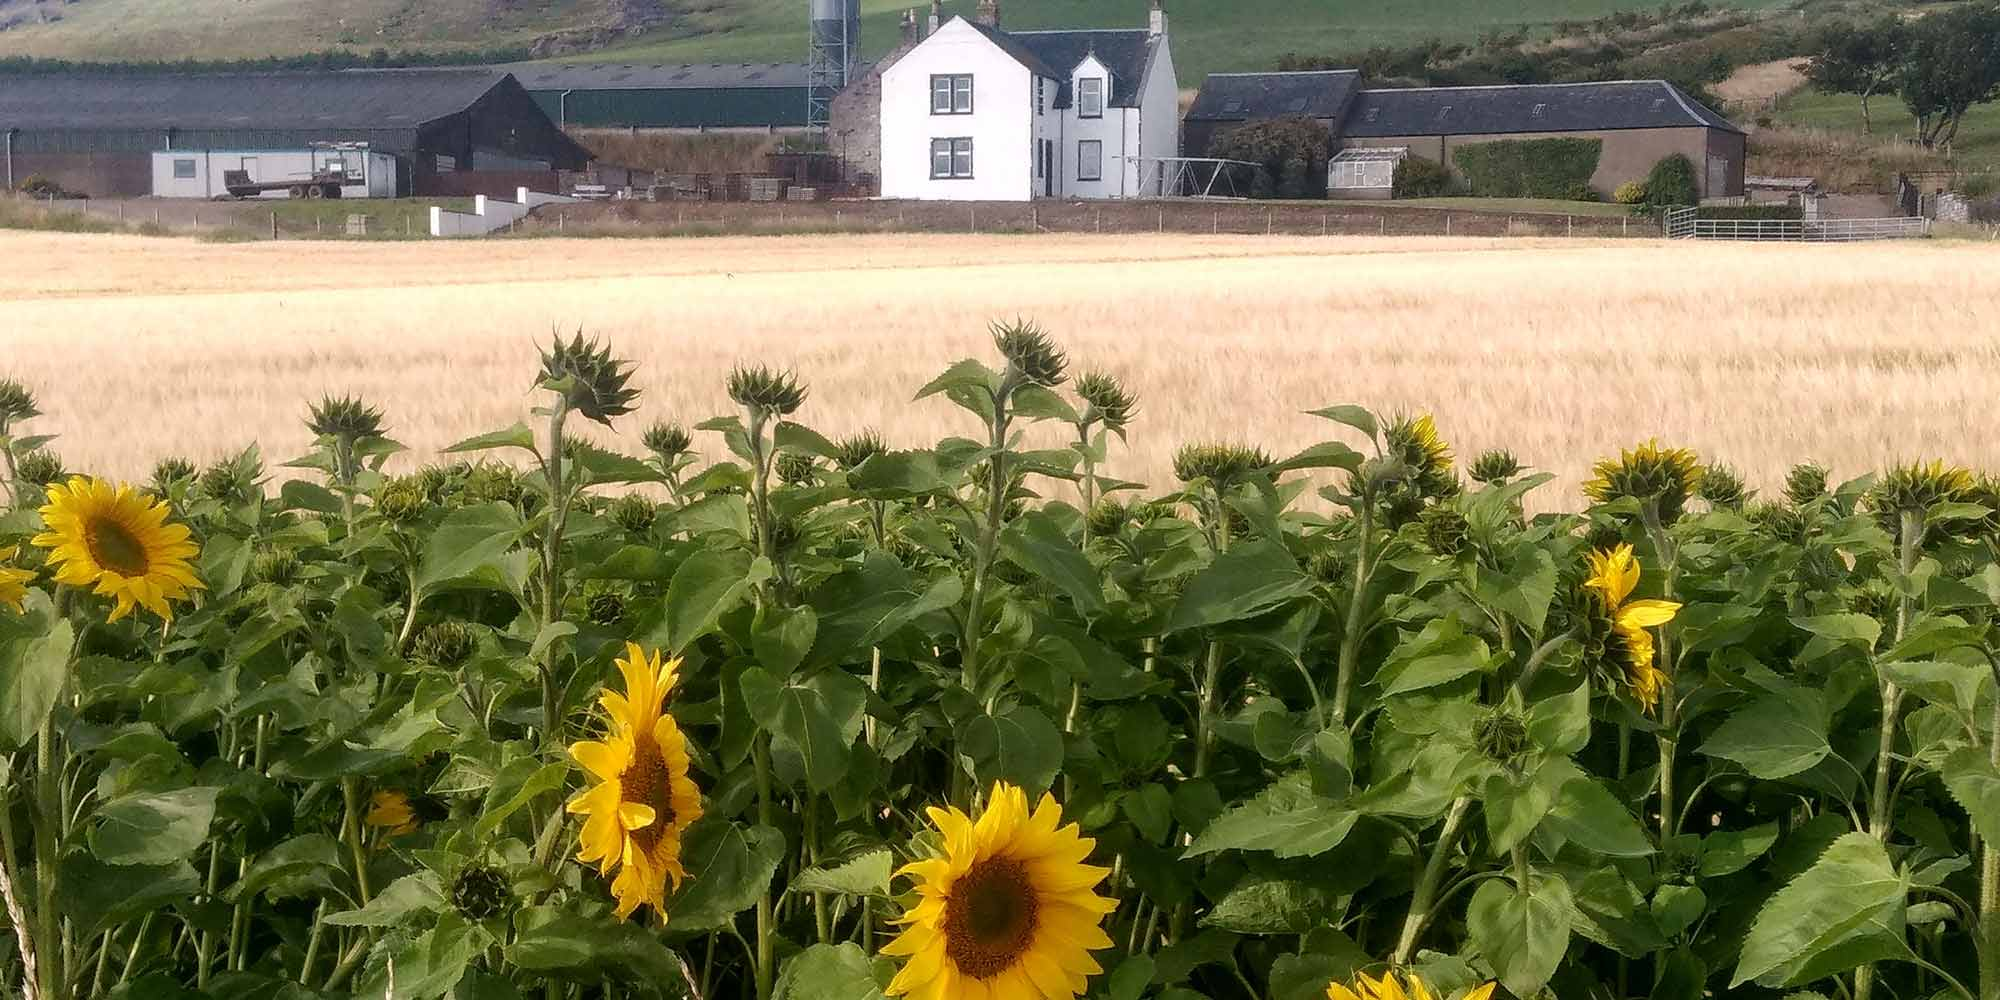 Glencraigs Farm